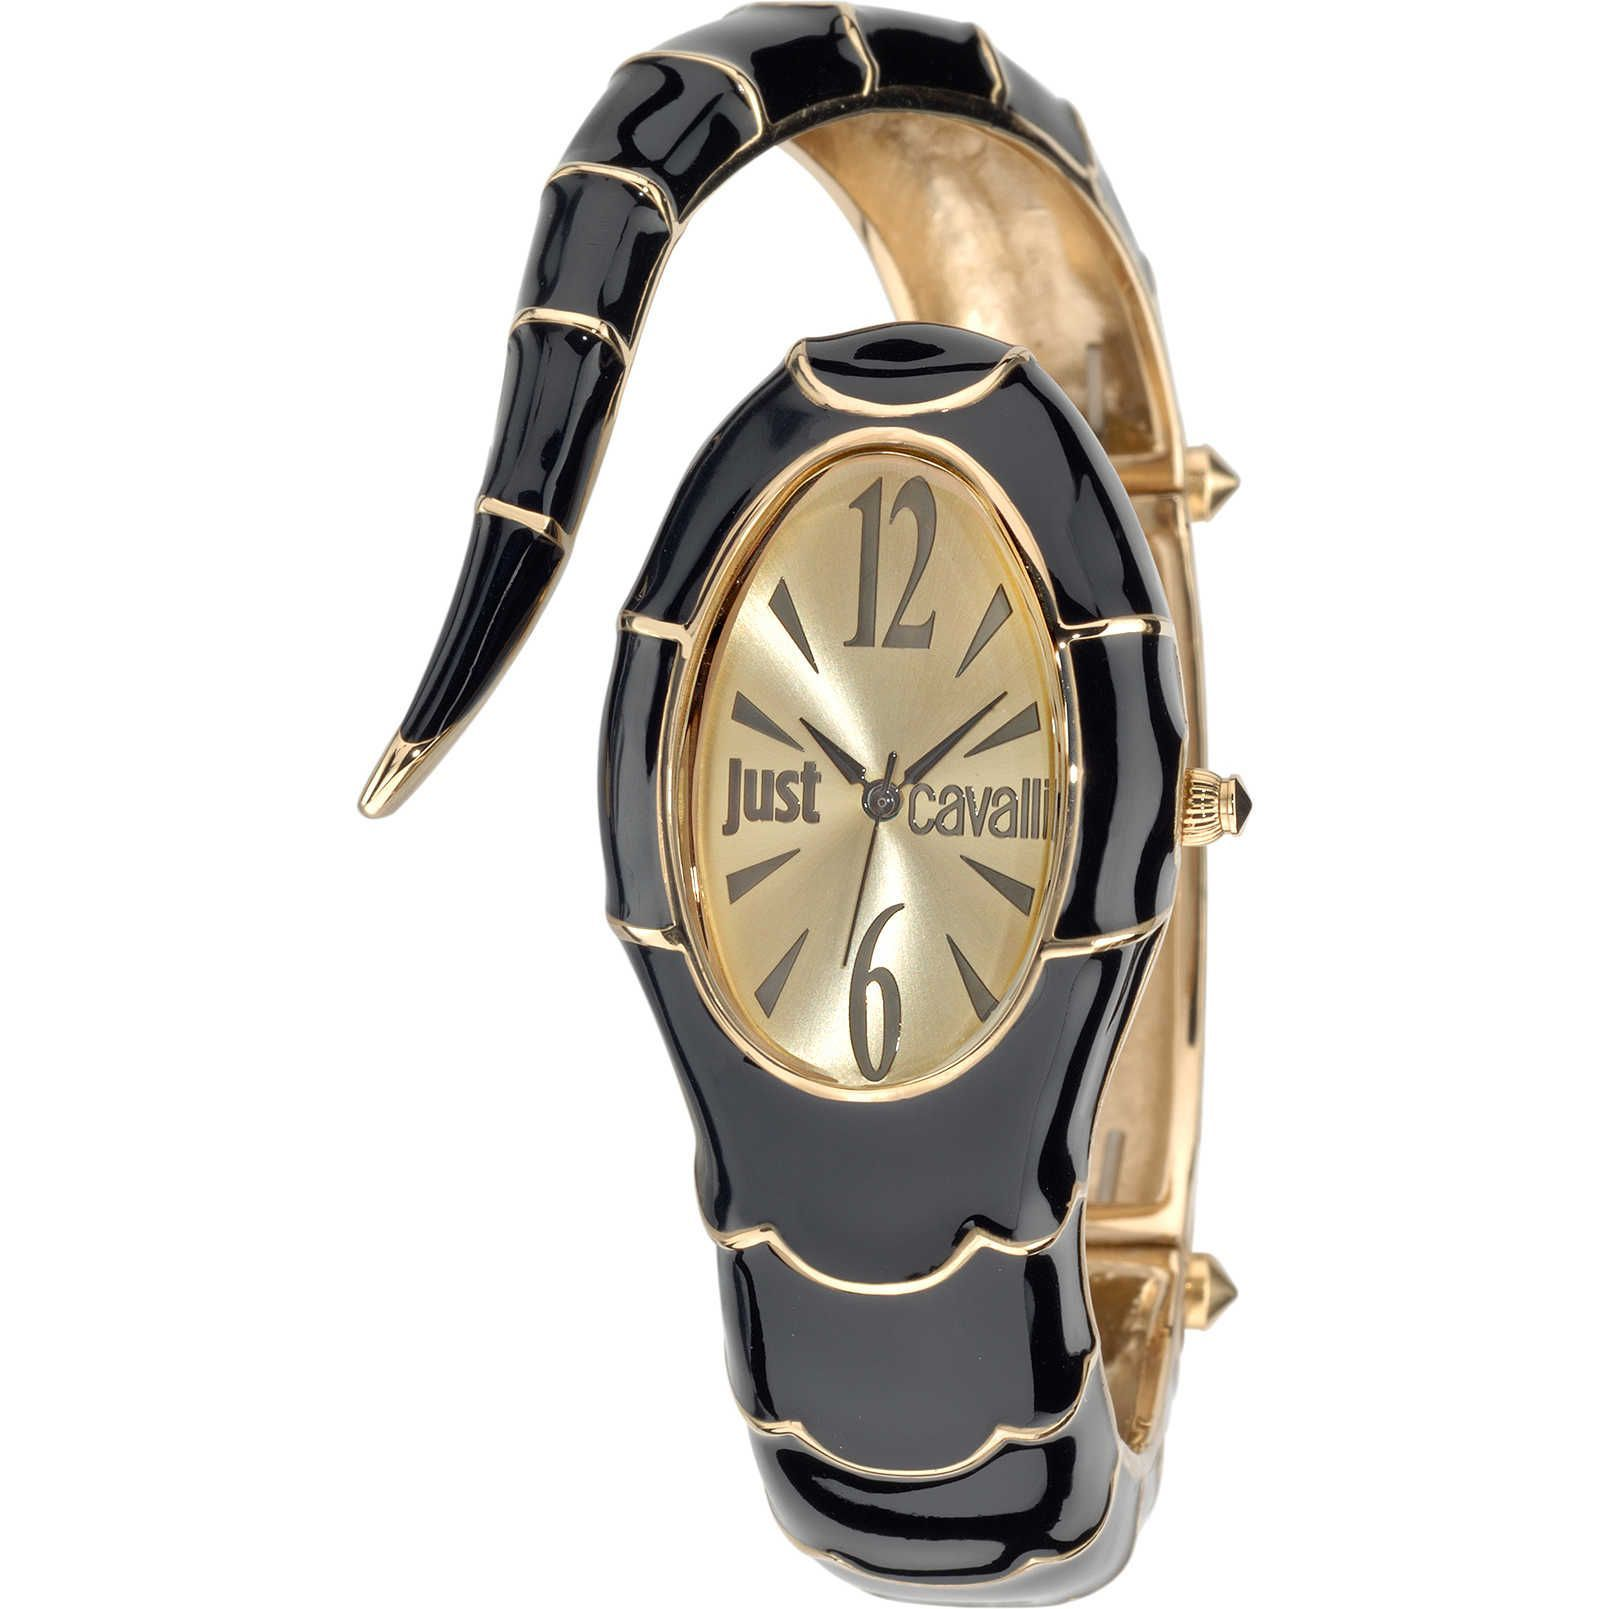 orologio Just Cavalli donna R7253153508 Poison